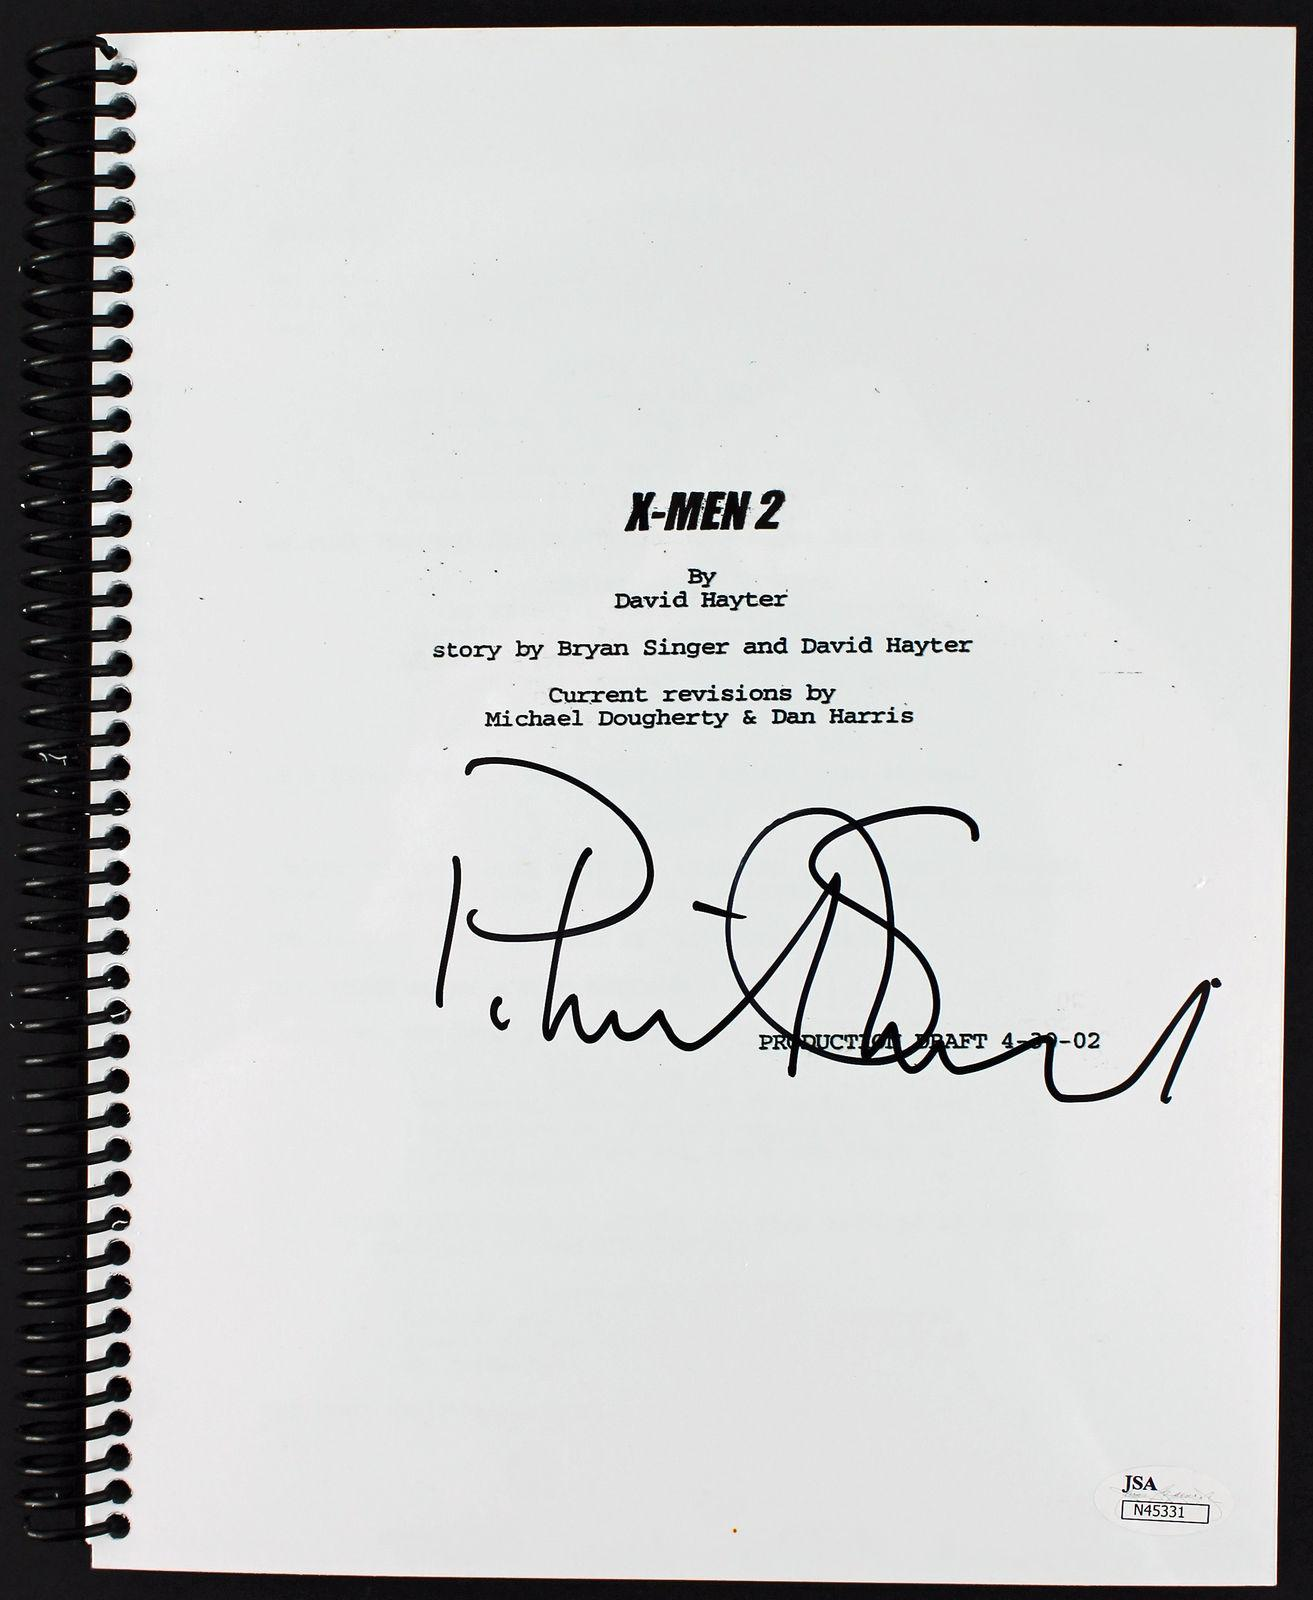 Patrick Stewart Signed X-Men 2 Script Autographed JSA #N45331